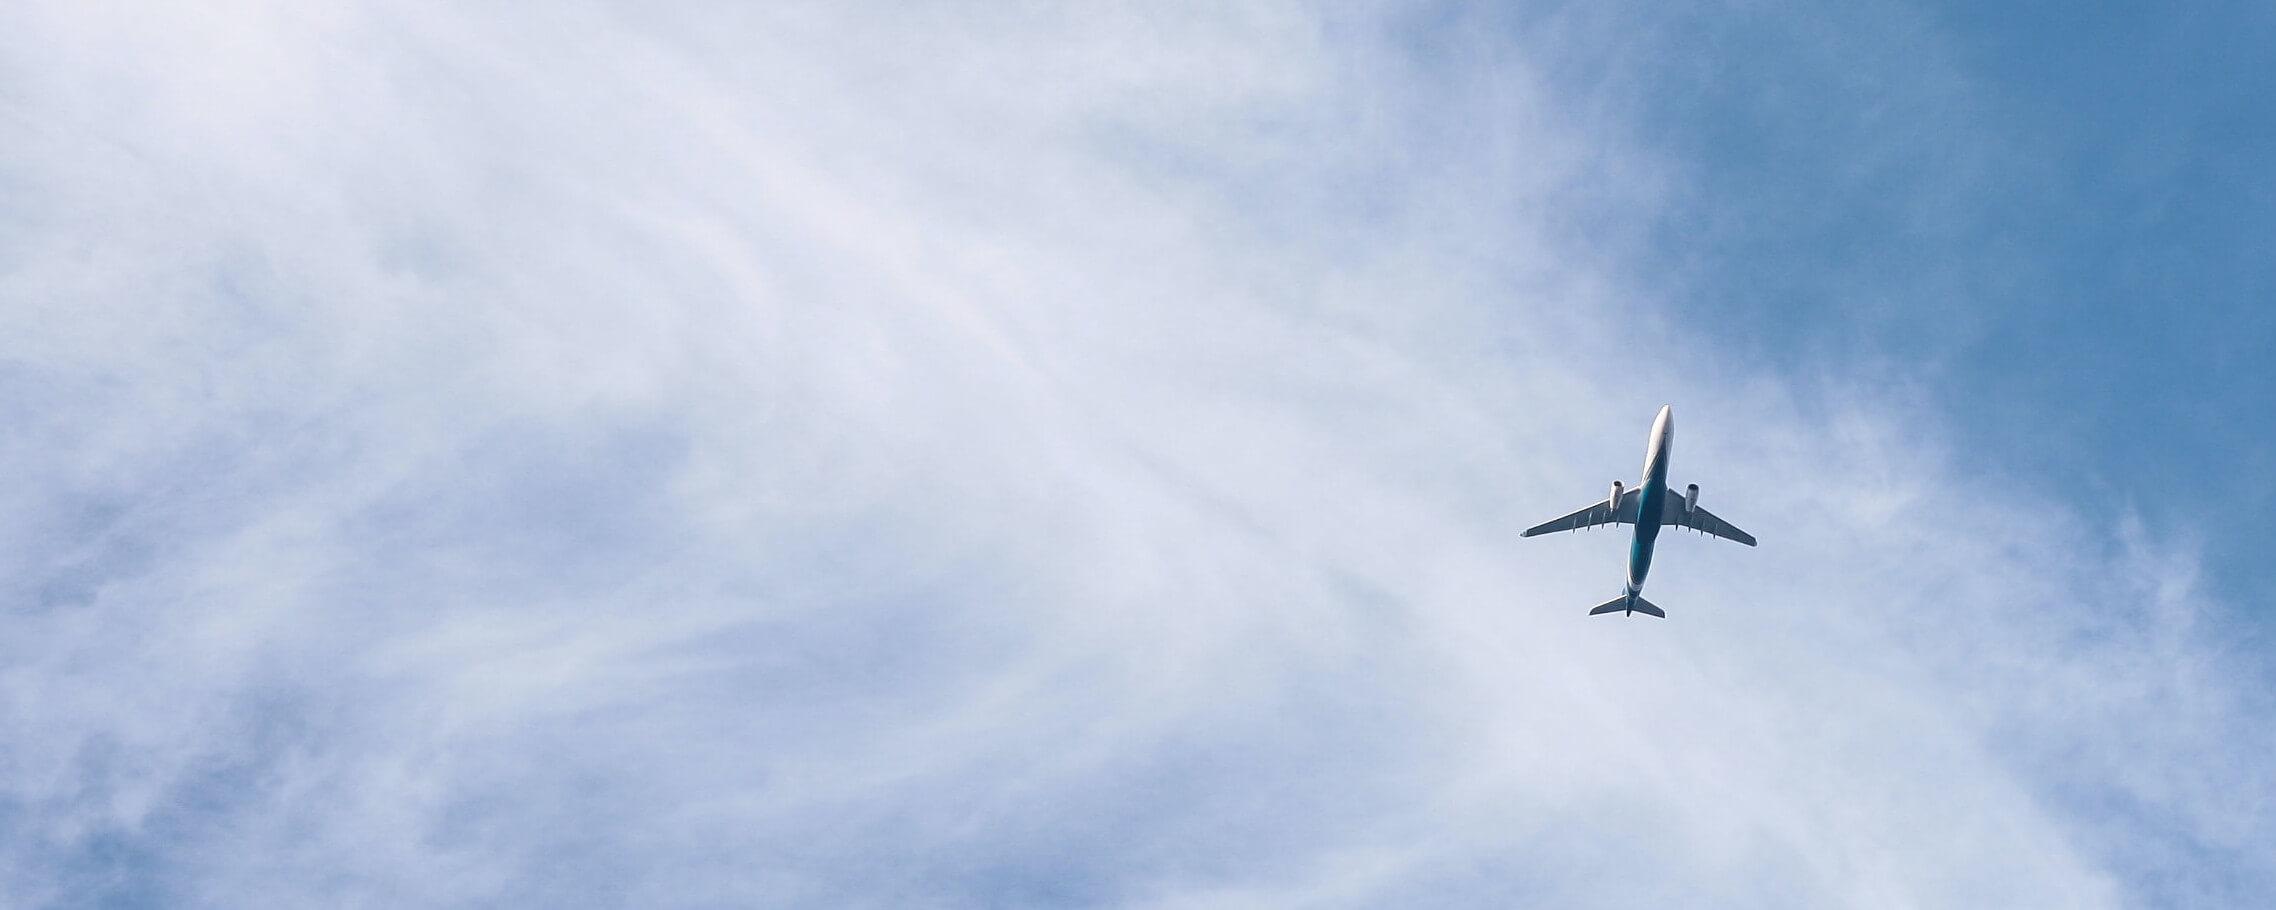 Flugscham - Flugzeug im Himmel